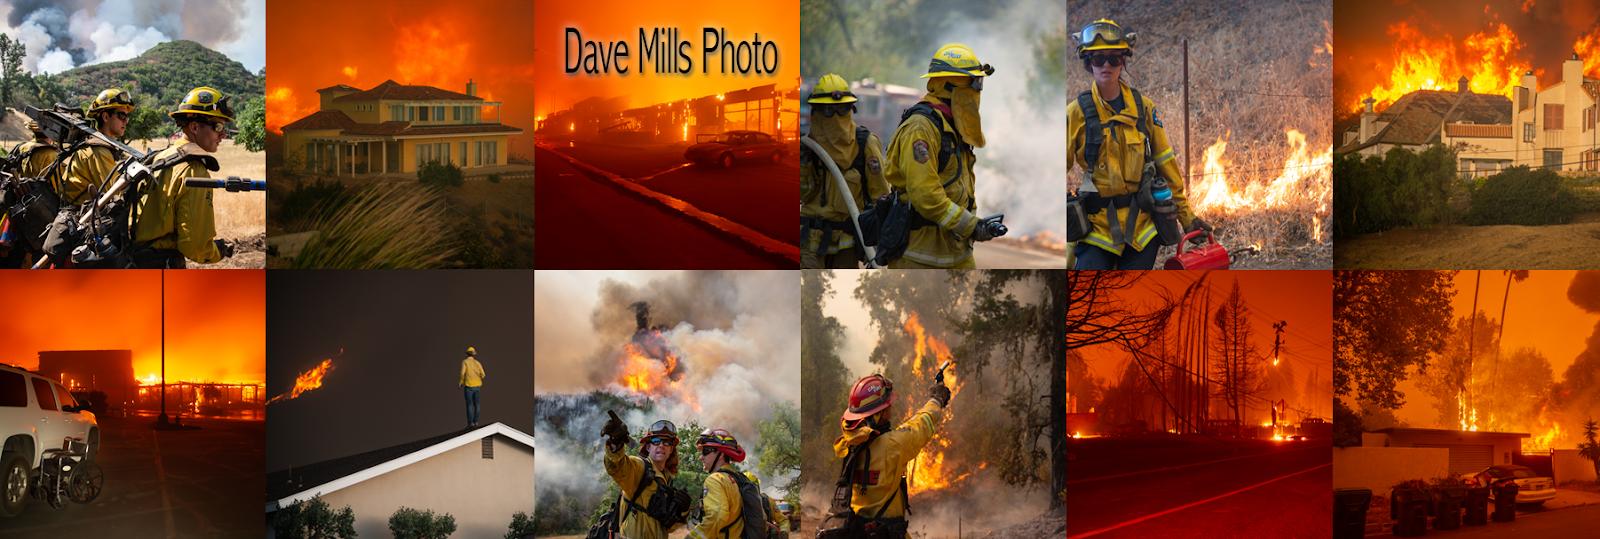 Dave Mills Photo